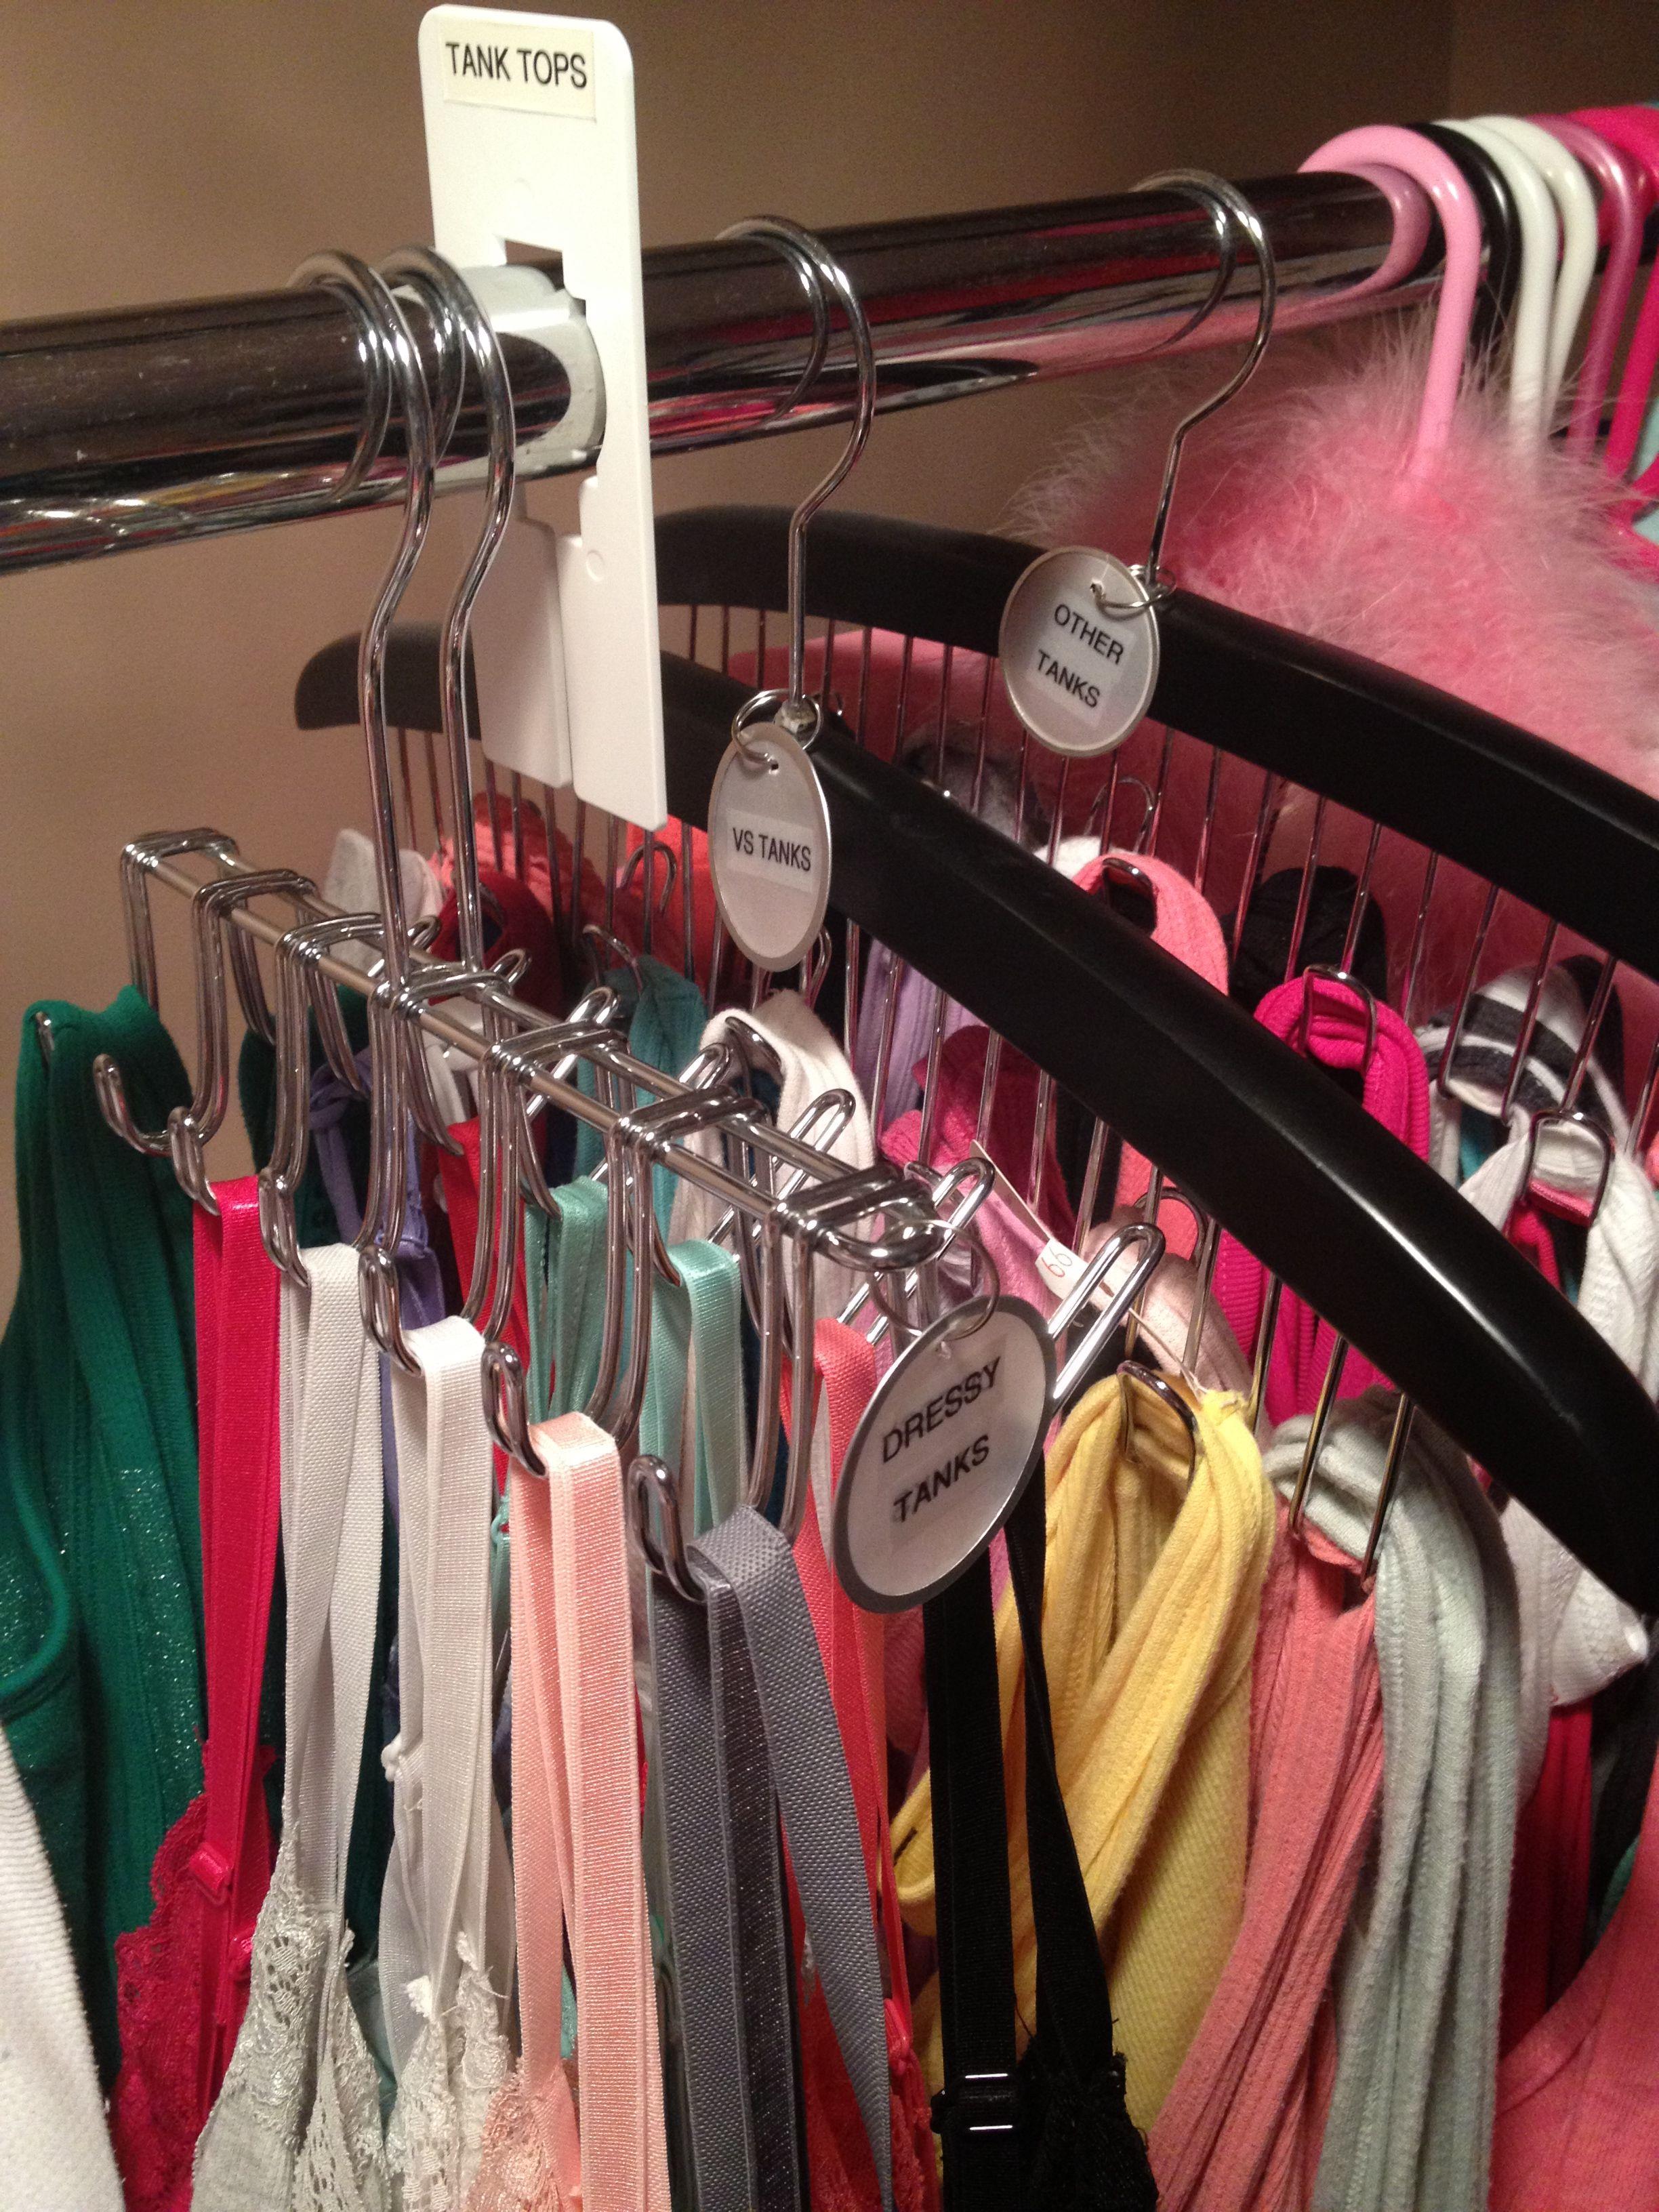 Diy Tank Top Organizer Belt Hanger Key Tags For Labels So